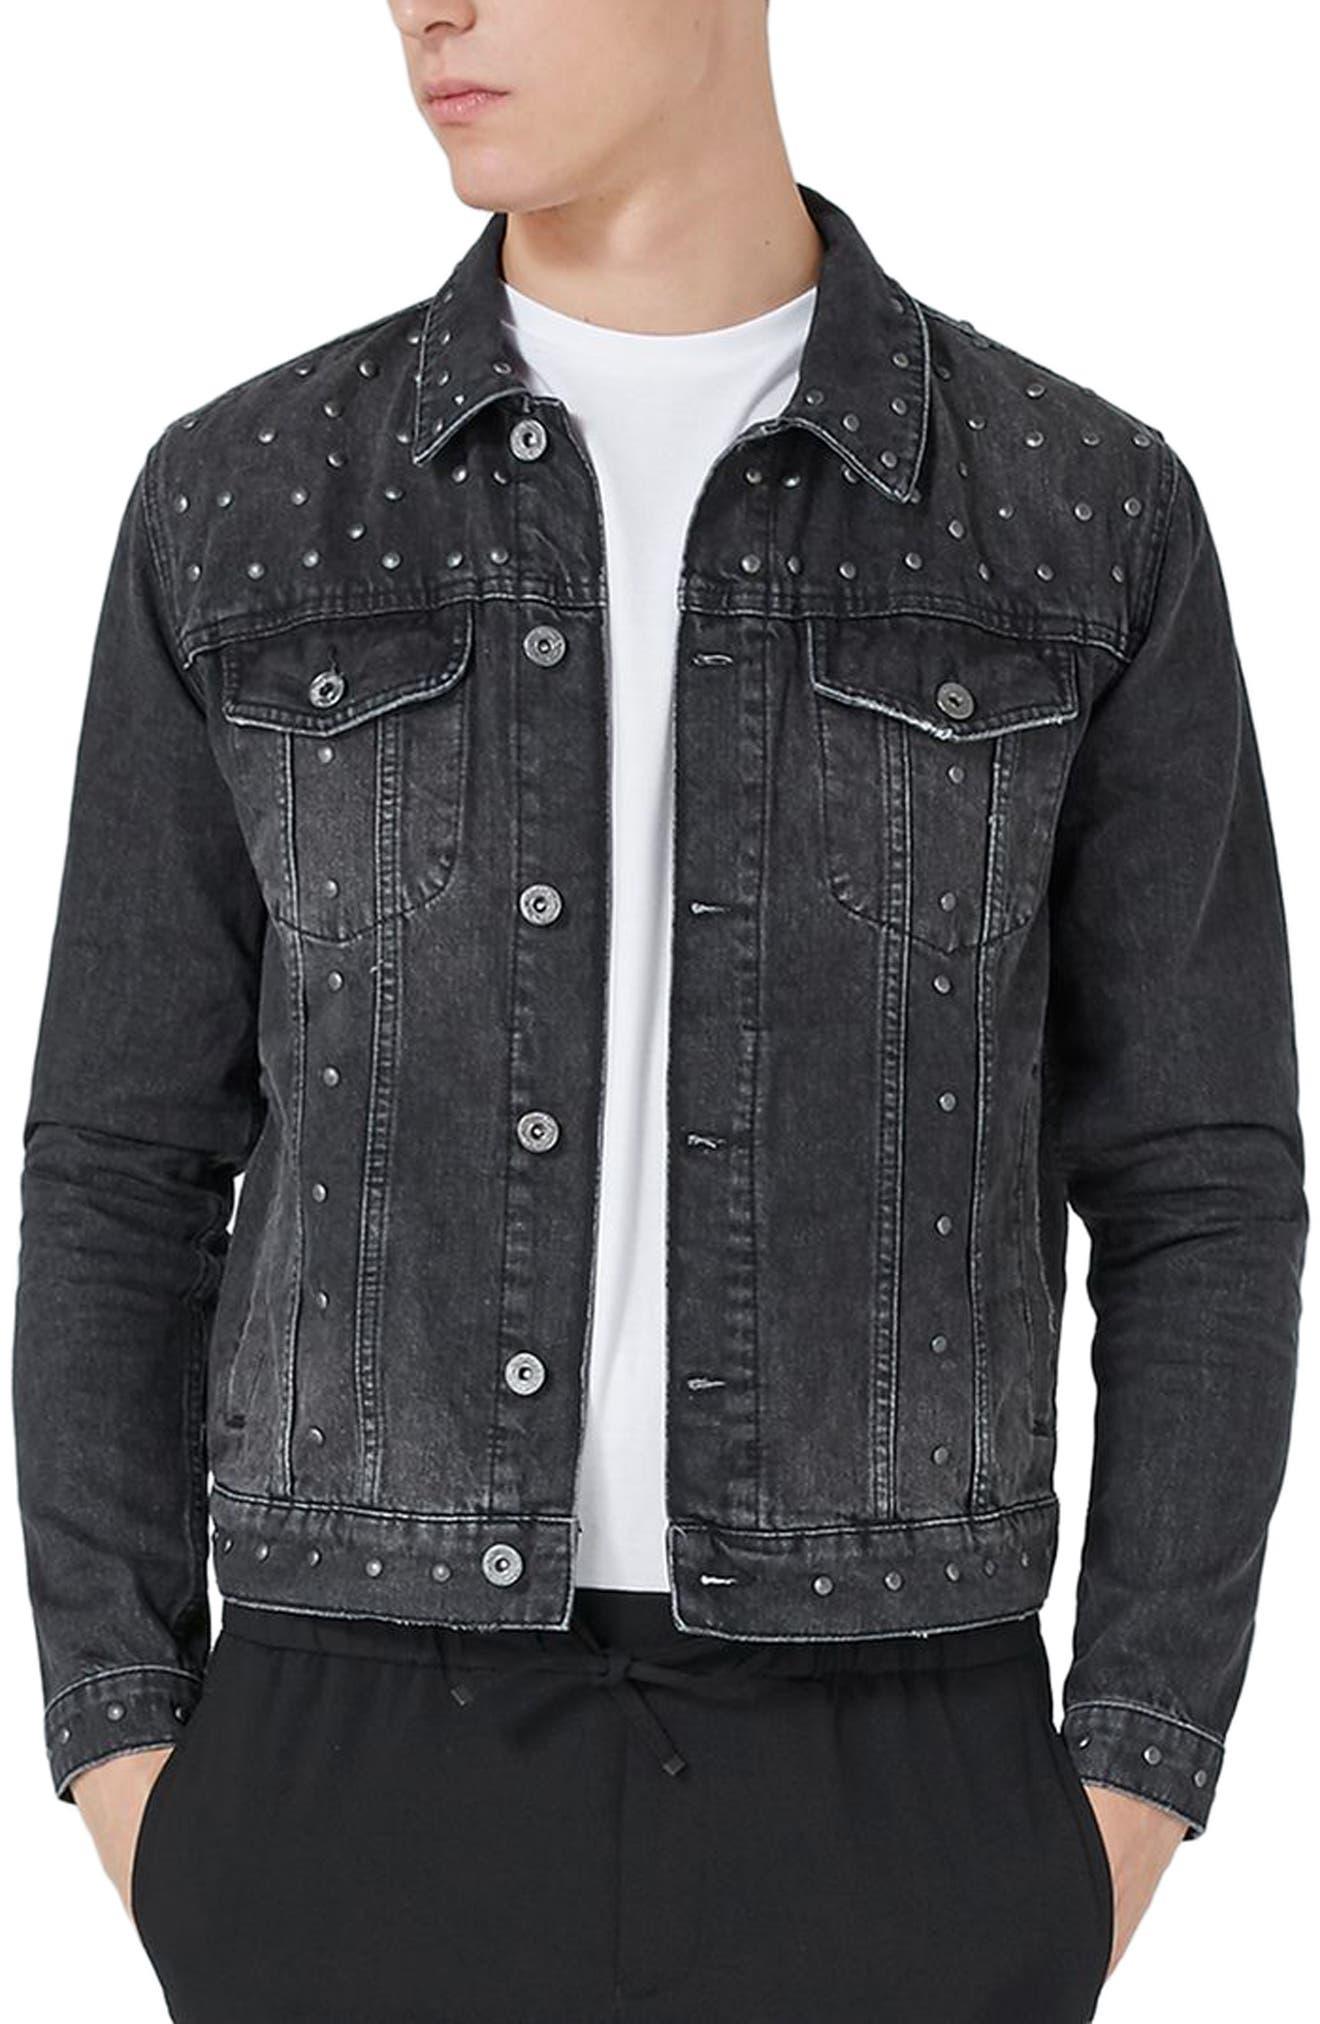 Topman Studded Denim Jacket